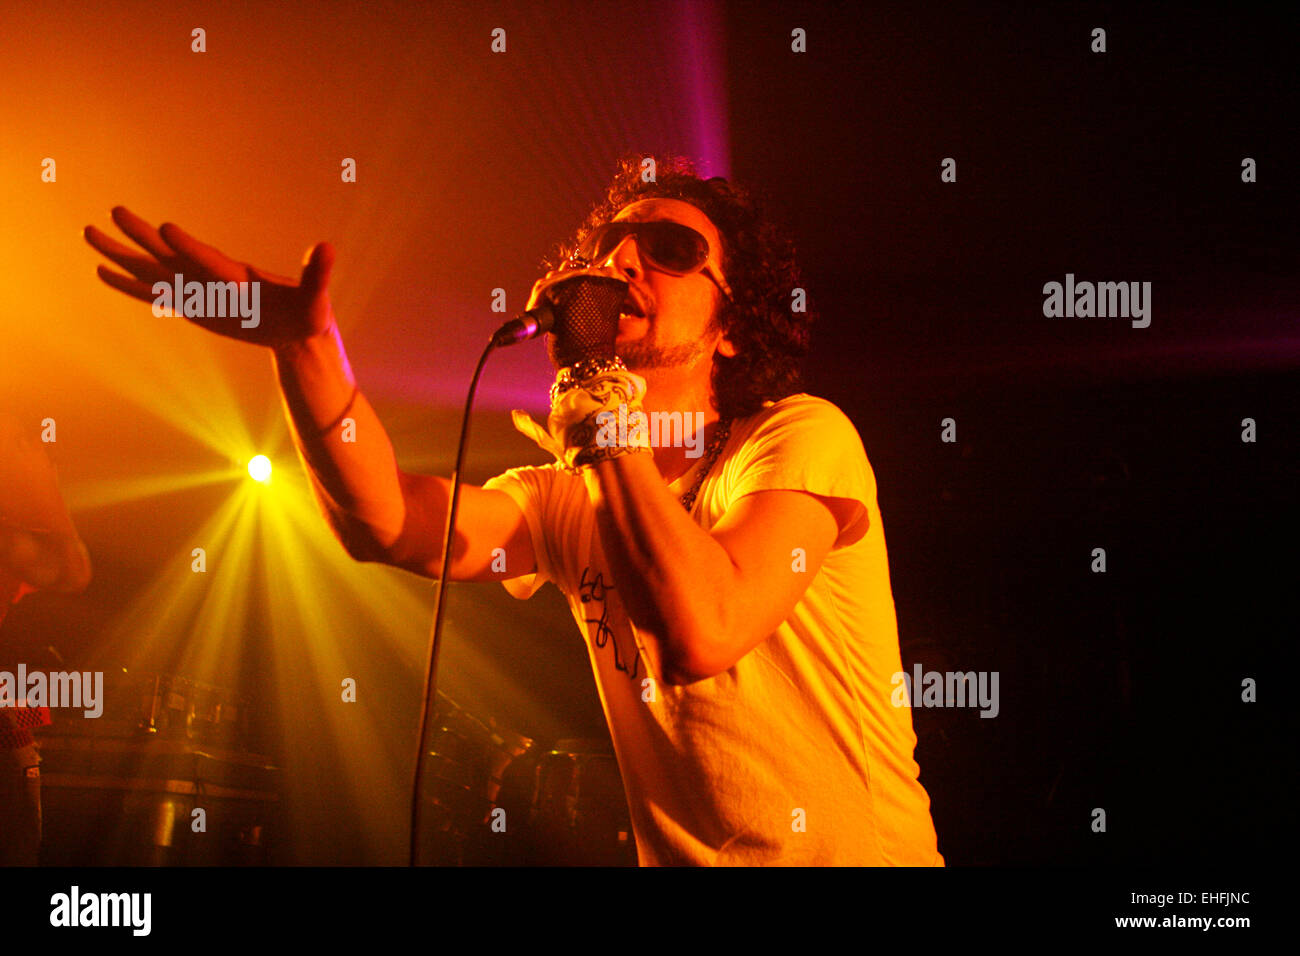 Jack Splash of Plantlife live at The Venue Edinburgh Scotland. - Stock Image